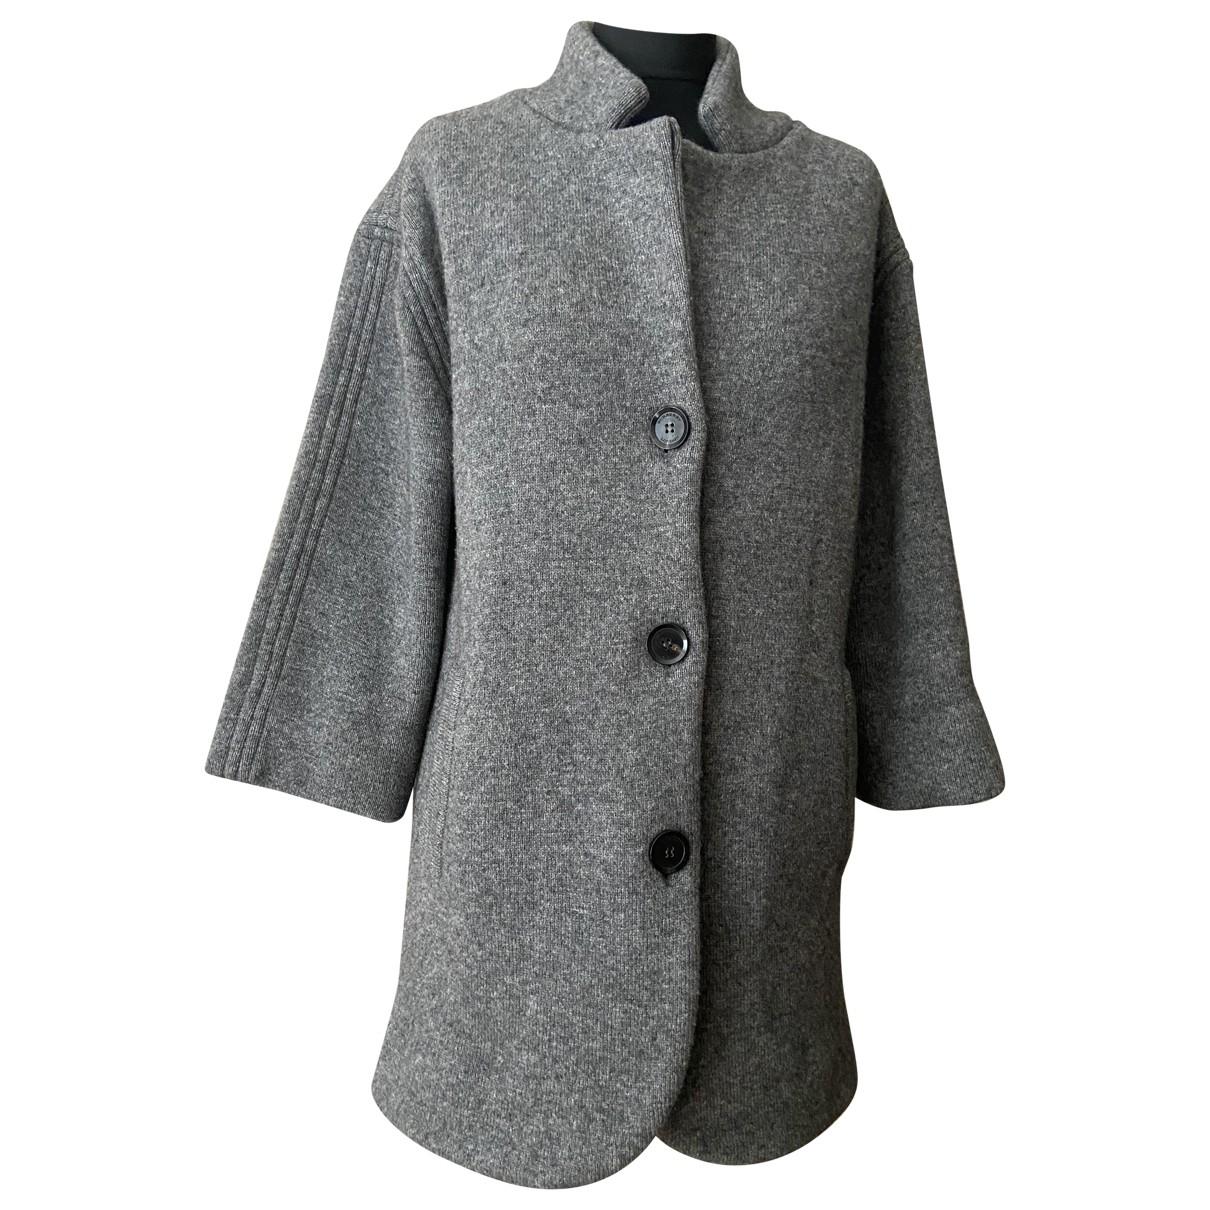 Burberry \N Grey Wool coat for Women S International